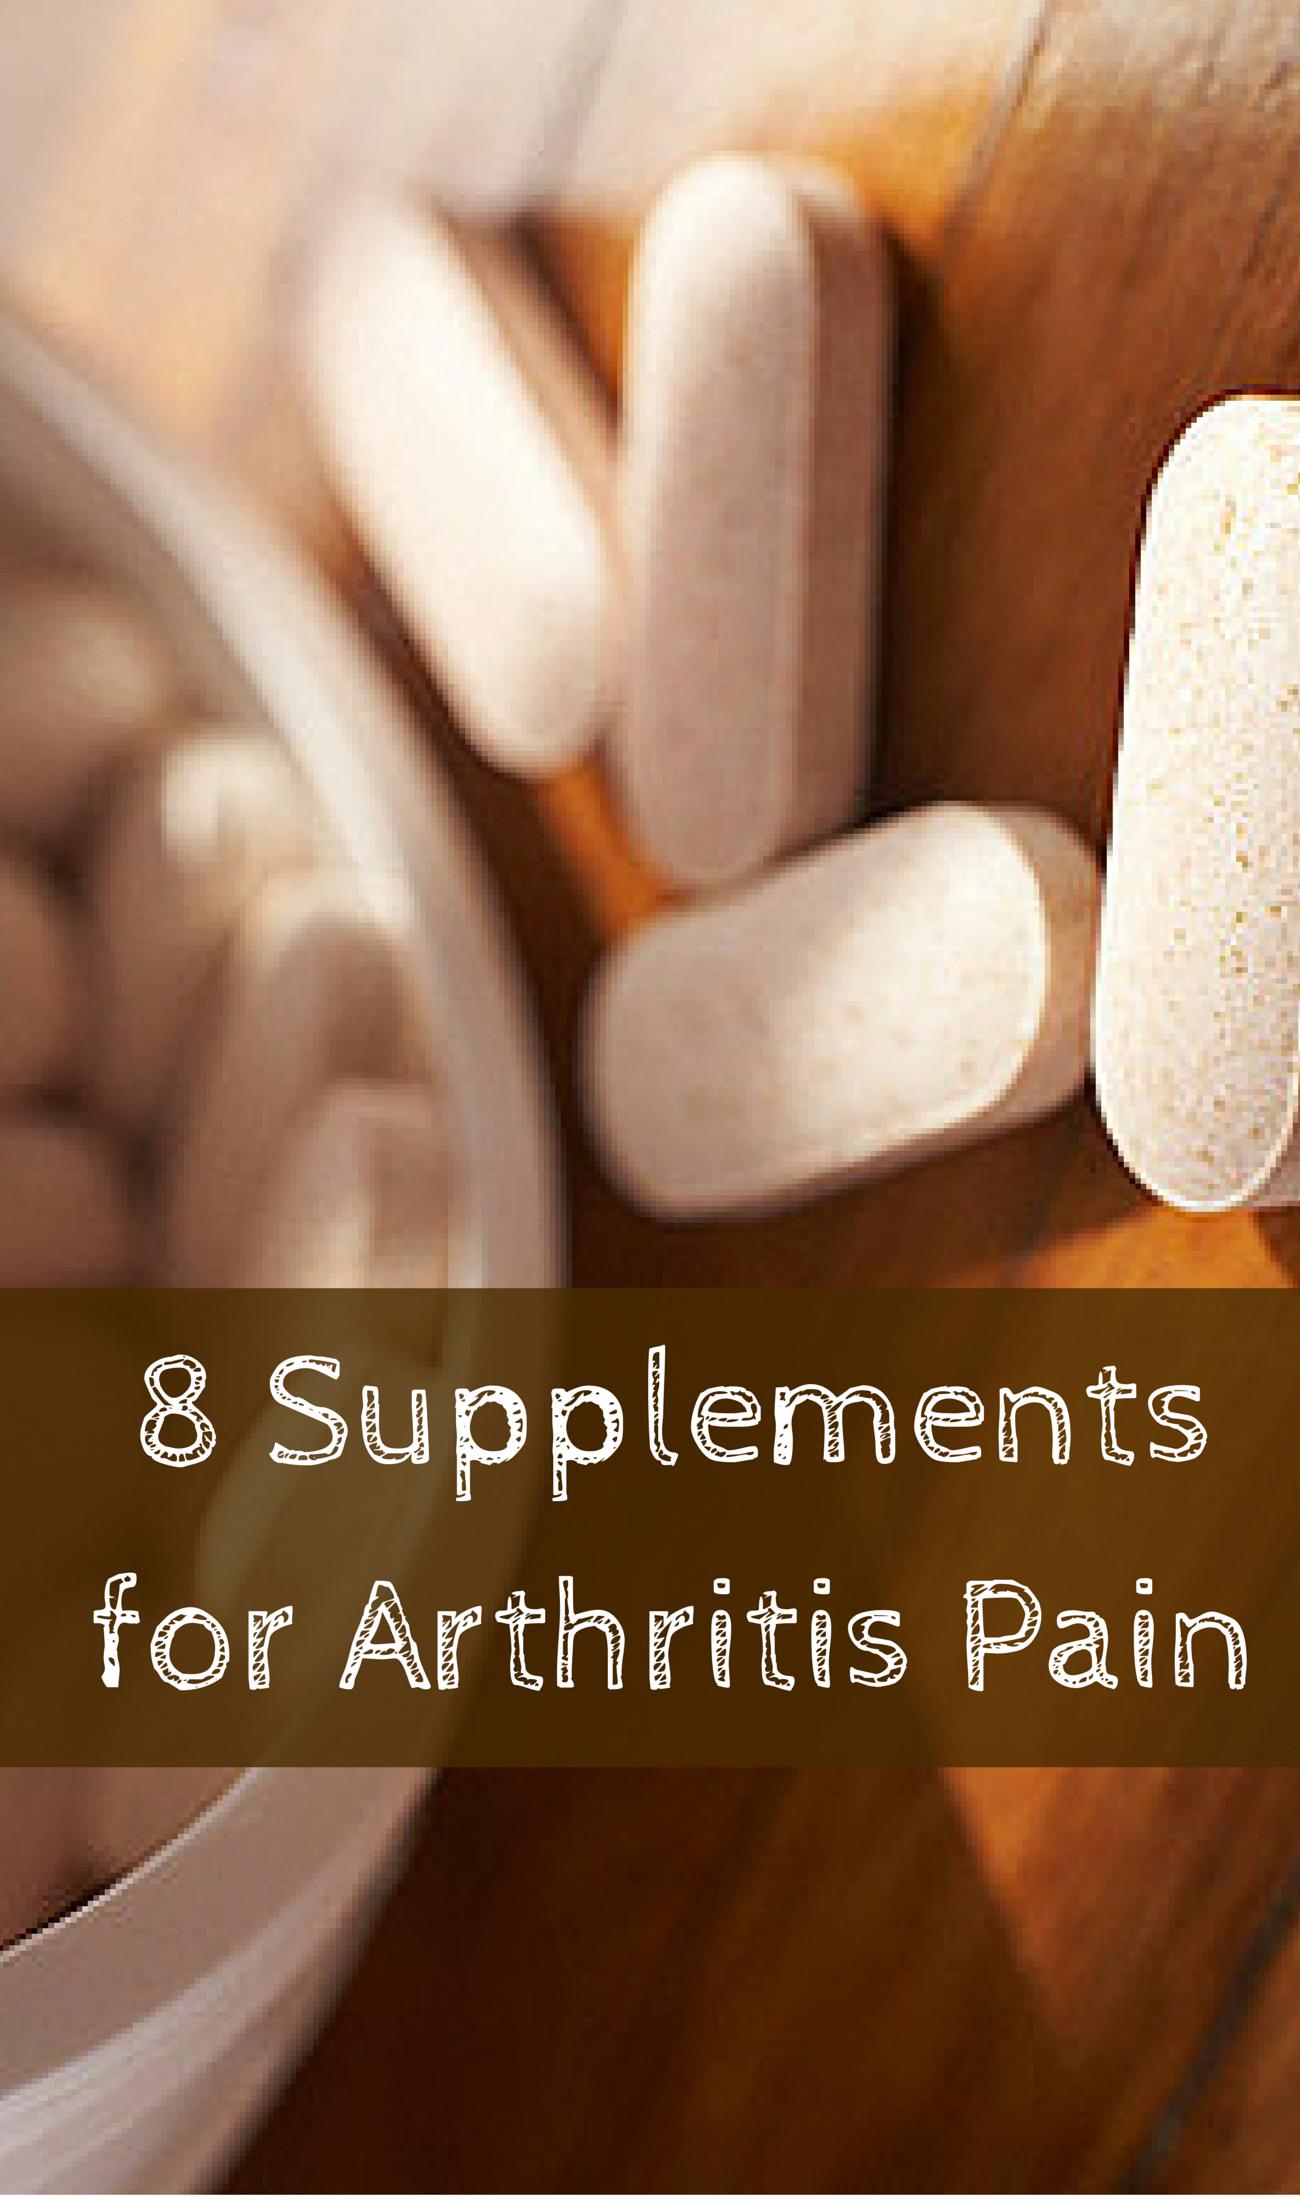 8 Supplements for Arthritis Pain